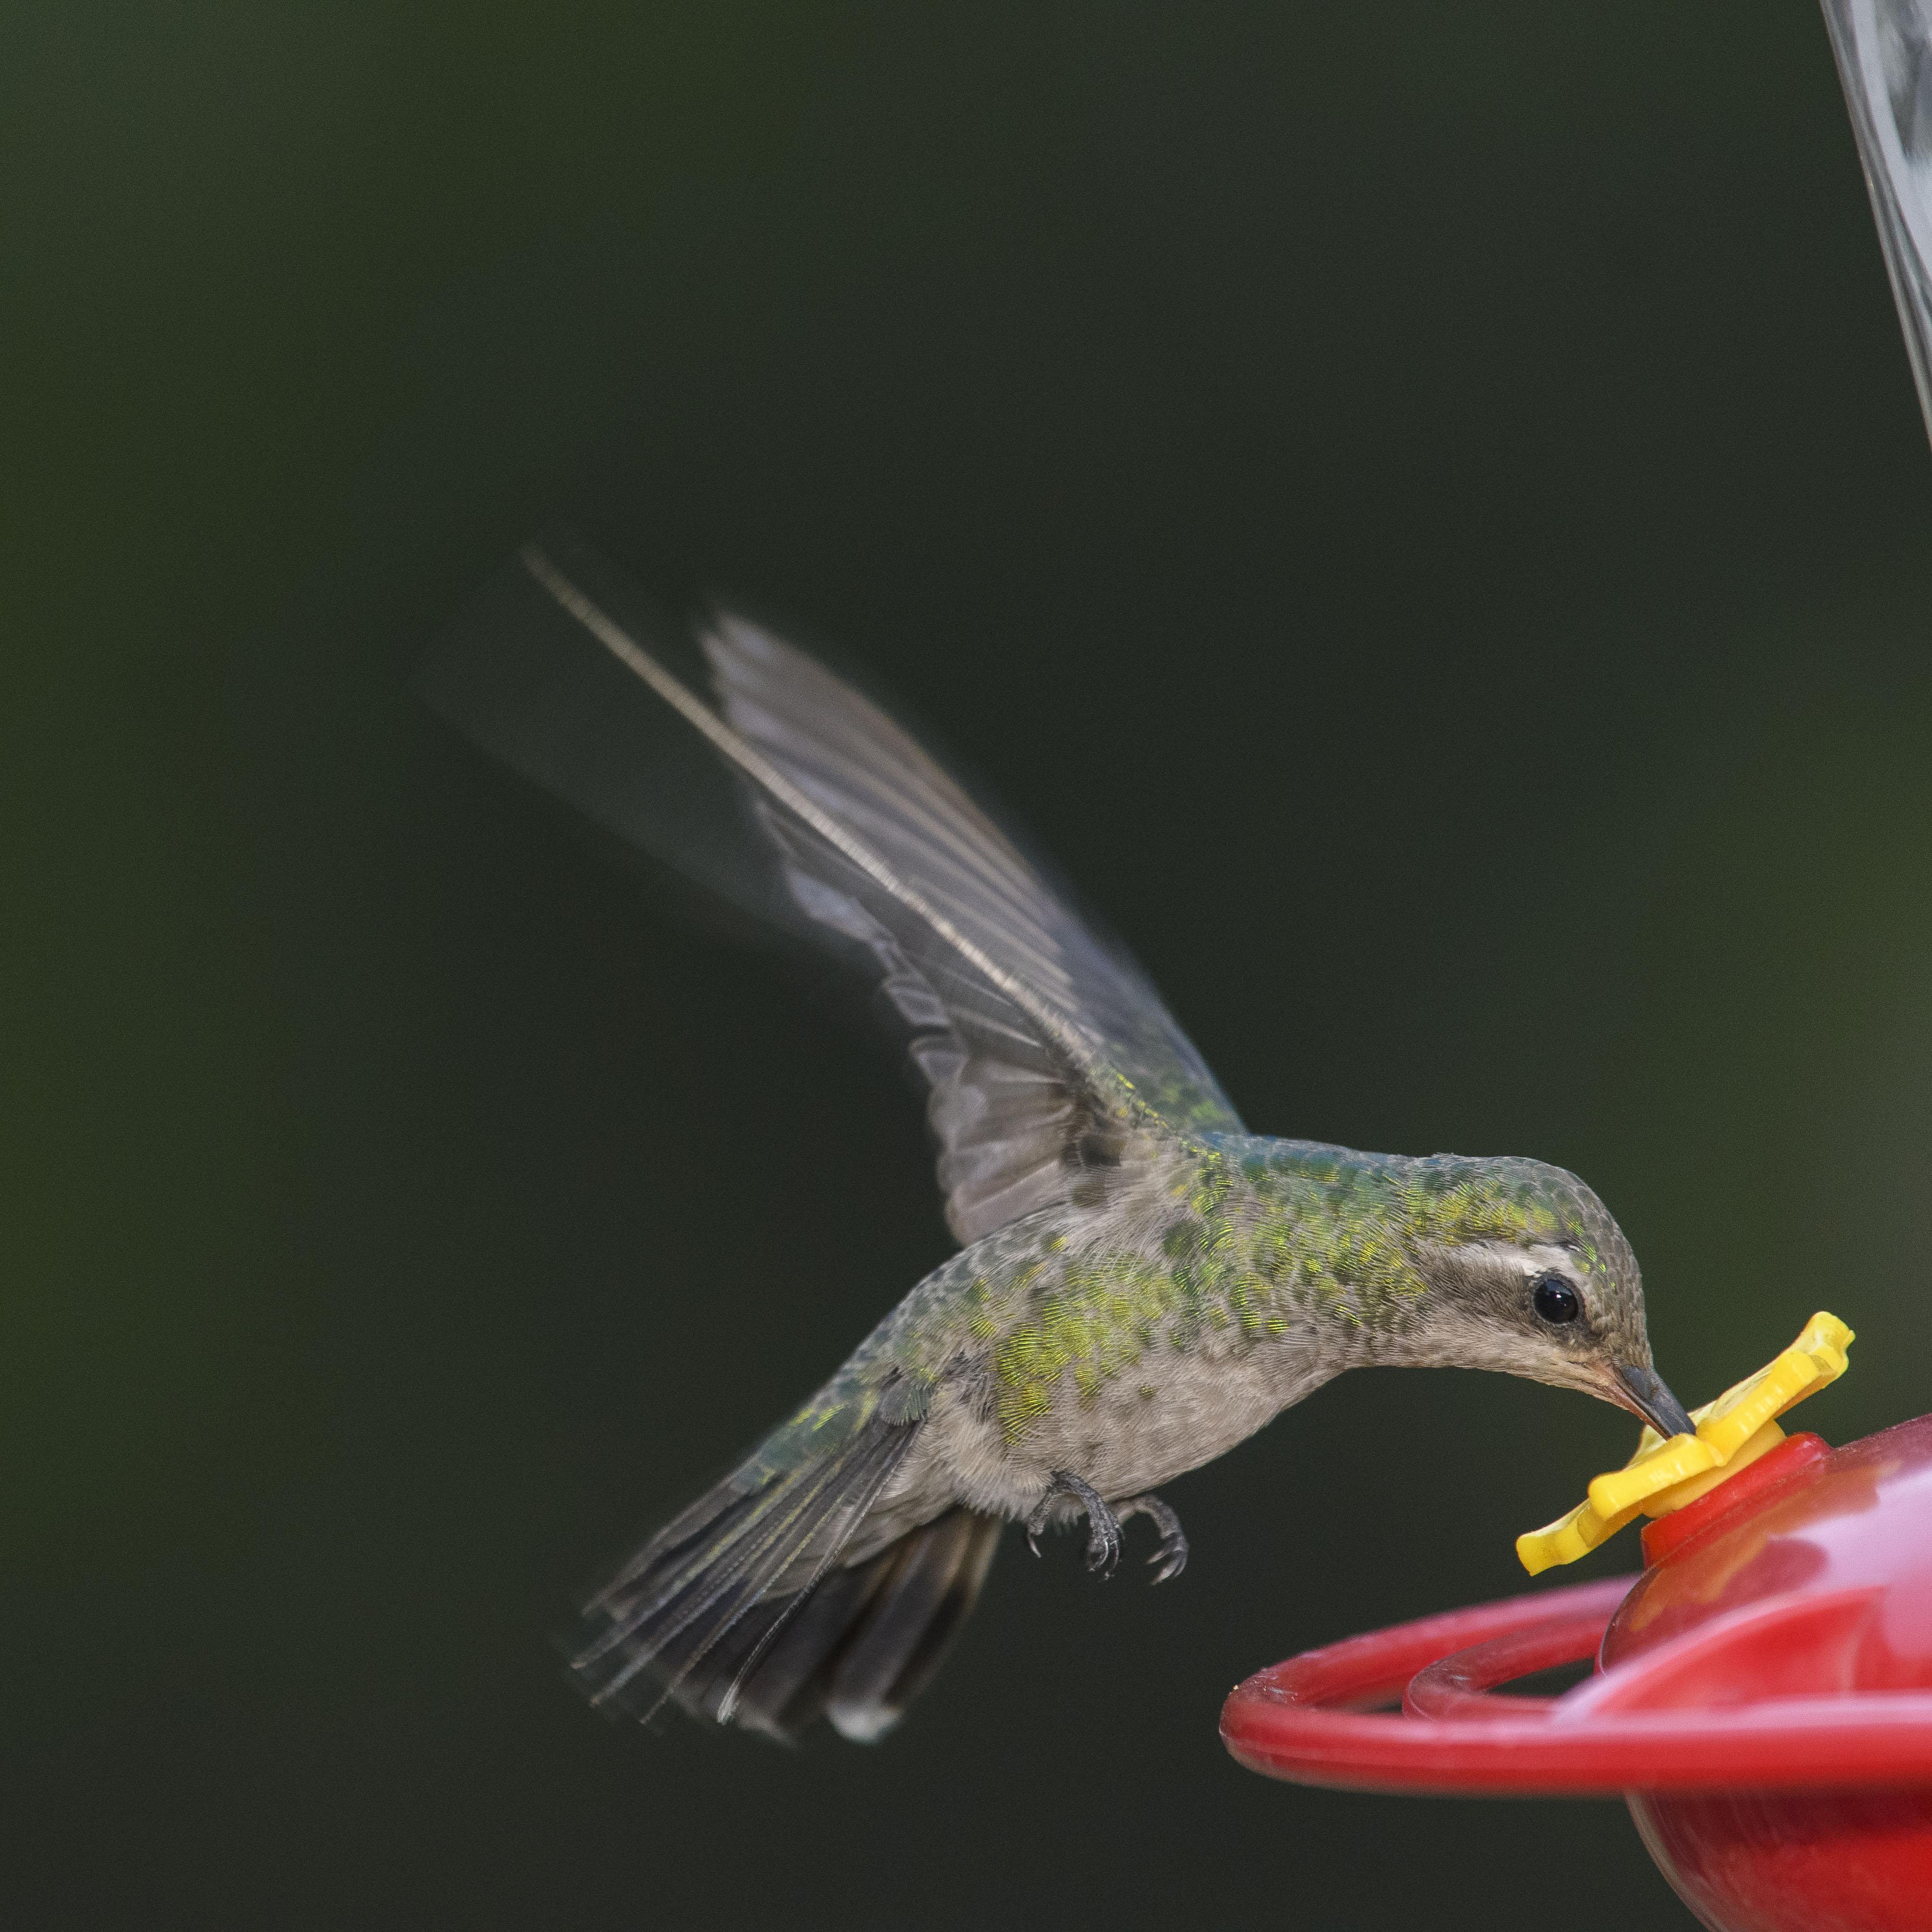 female to feeder 4